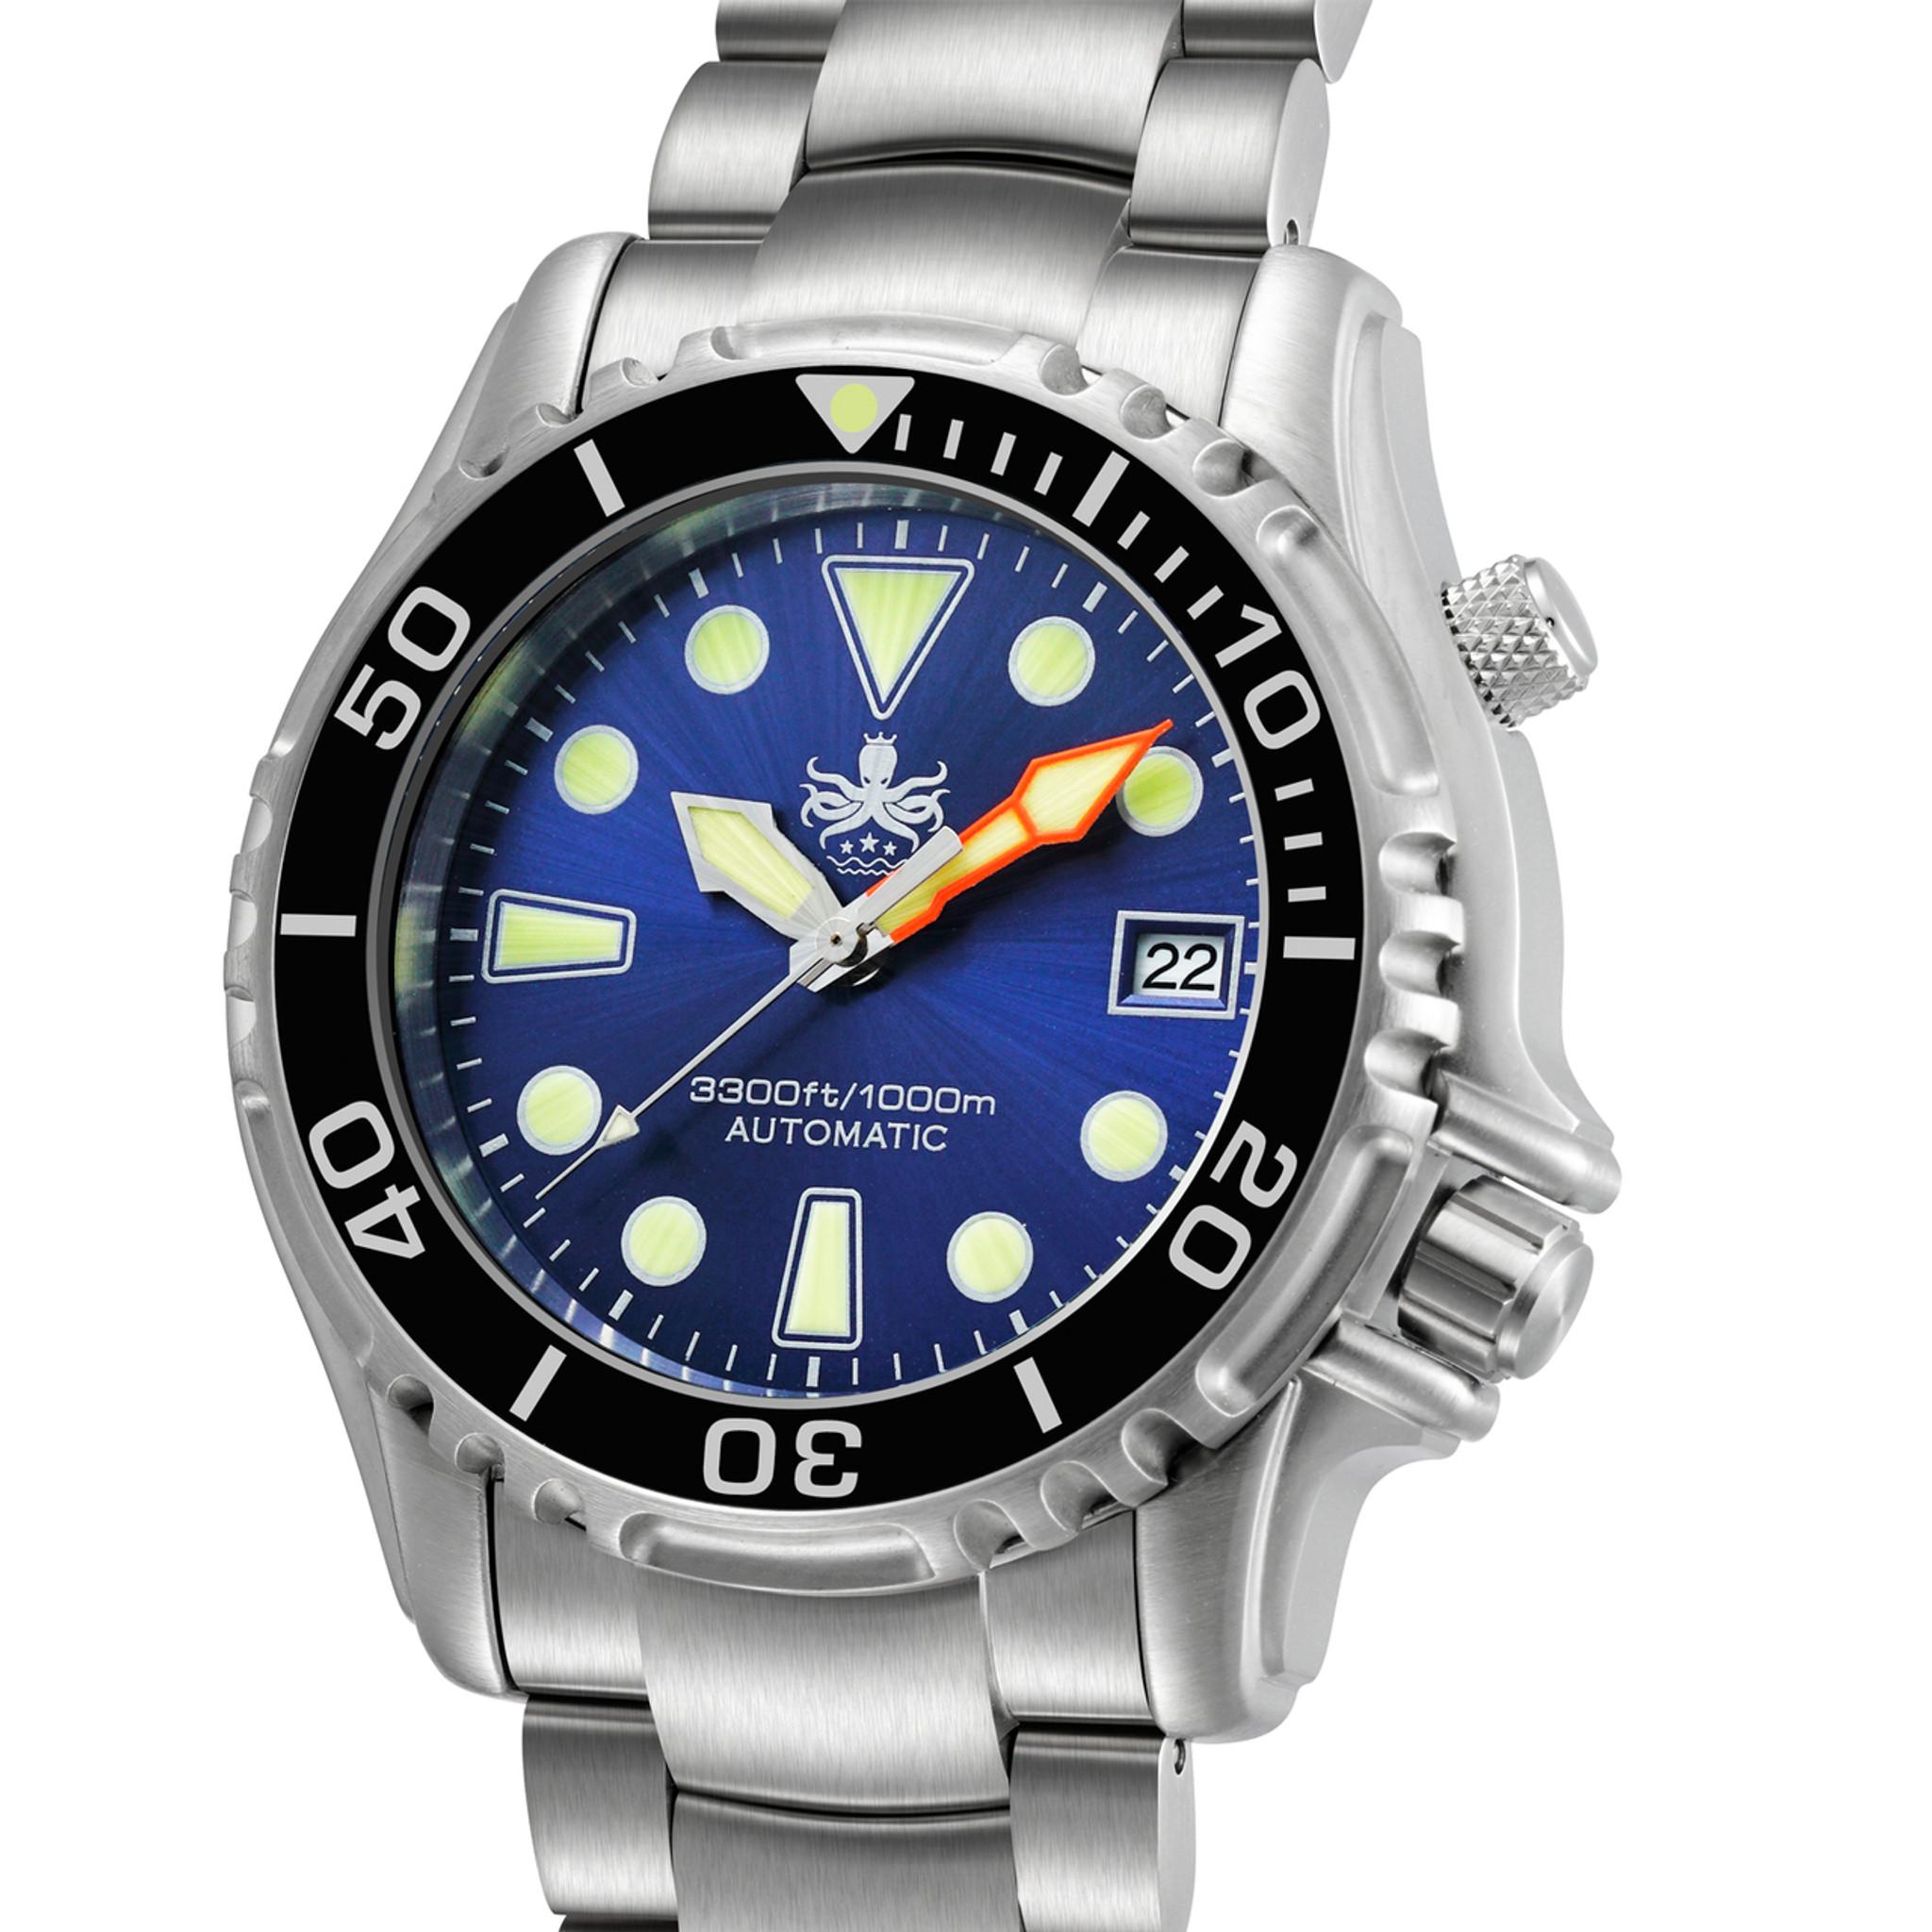 Phoibos ocean master py005b 1000m automatic dive watch blue - Oceanic dive watch ...